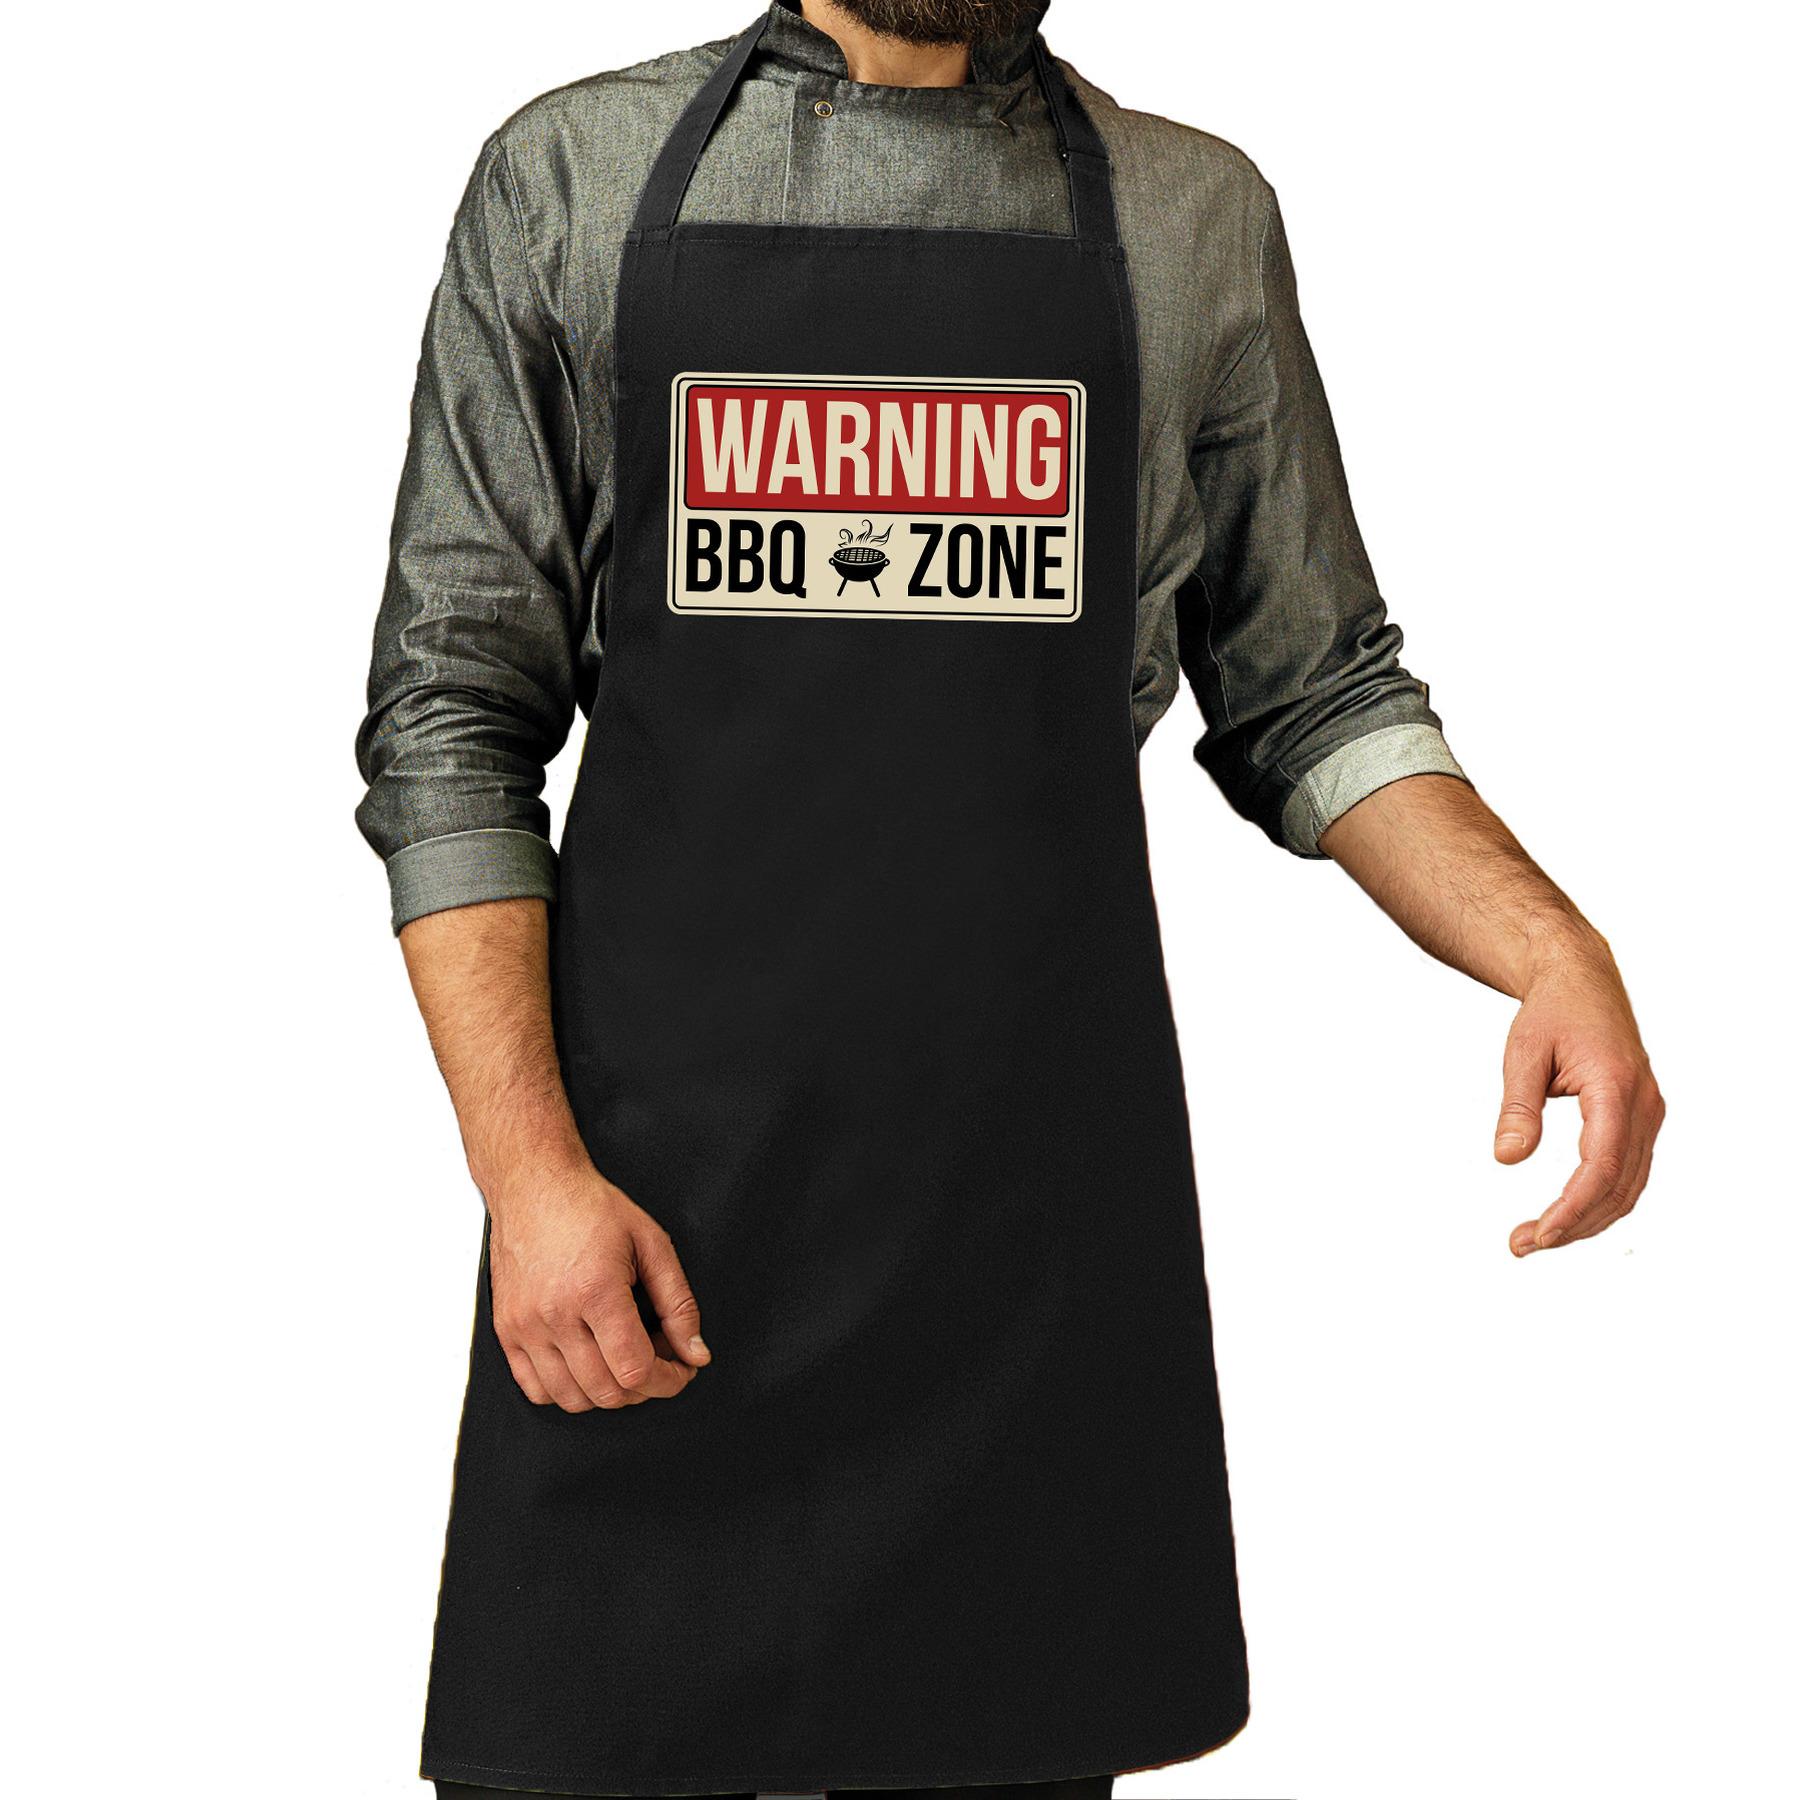 Warning bbq zone bbq schort - keukenschort zwart heren